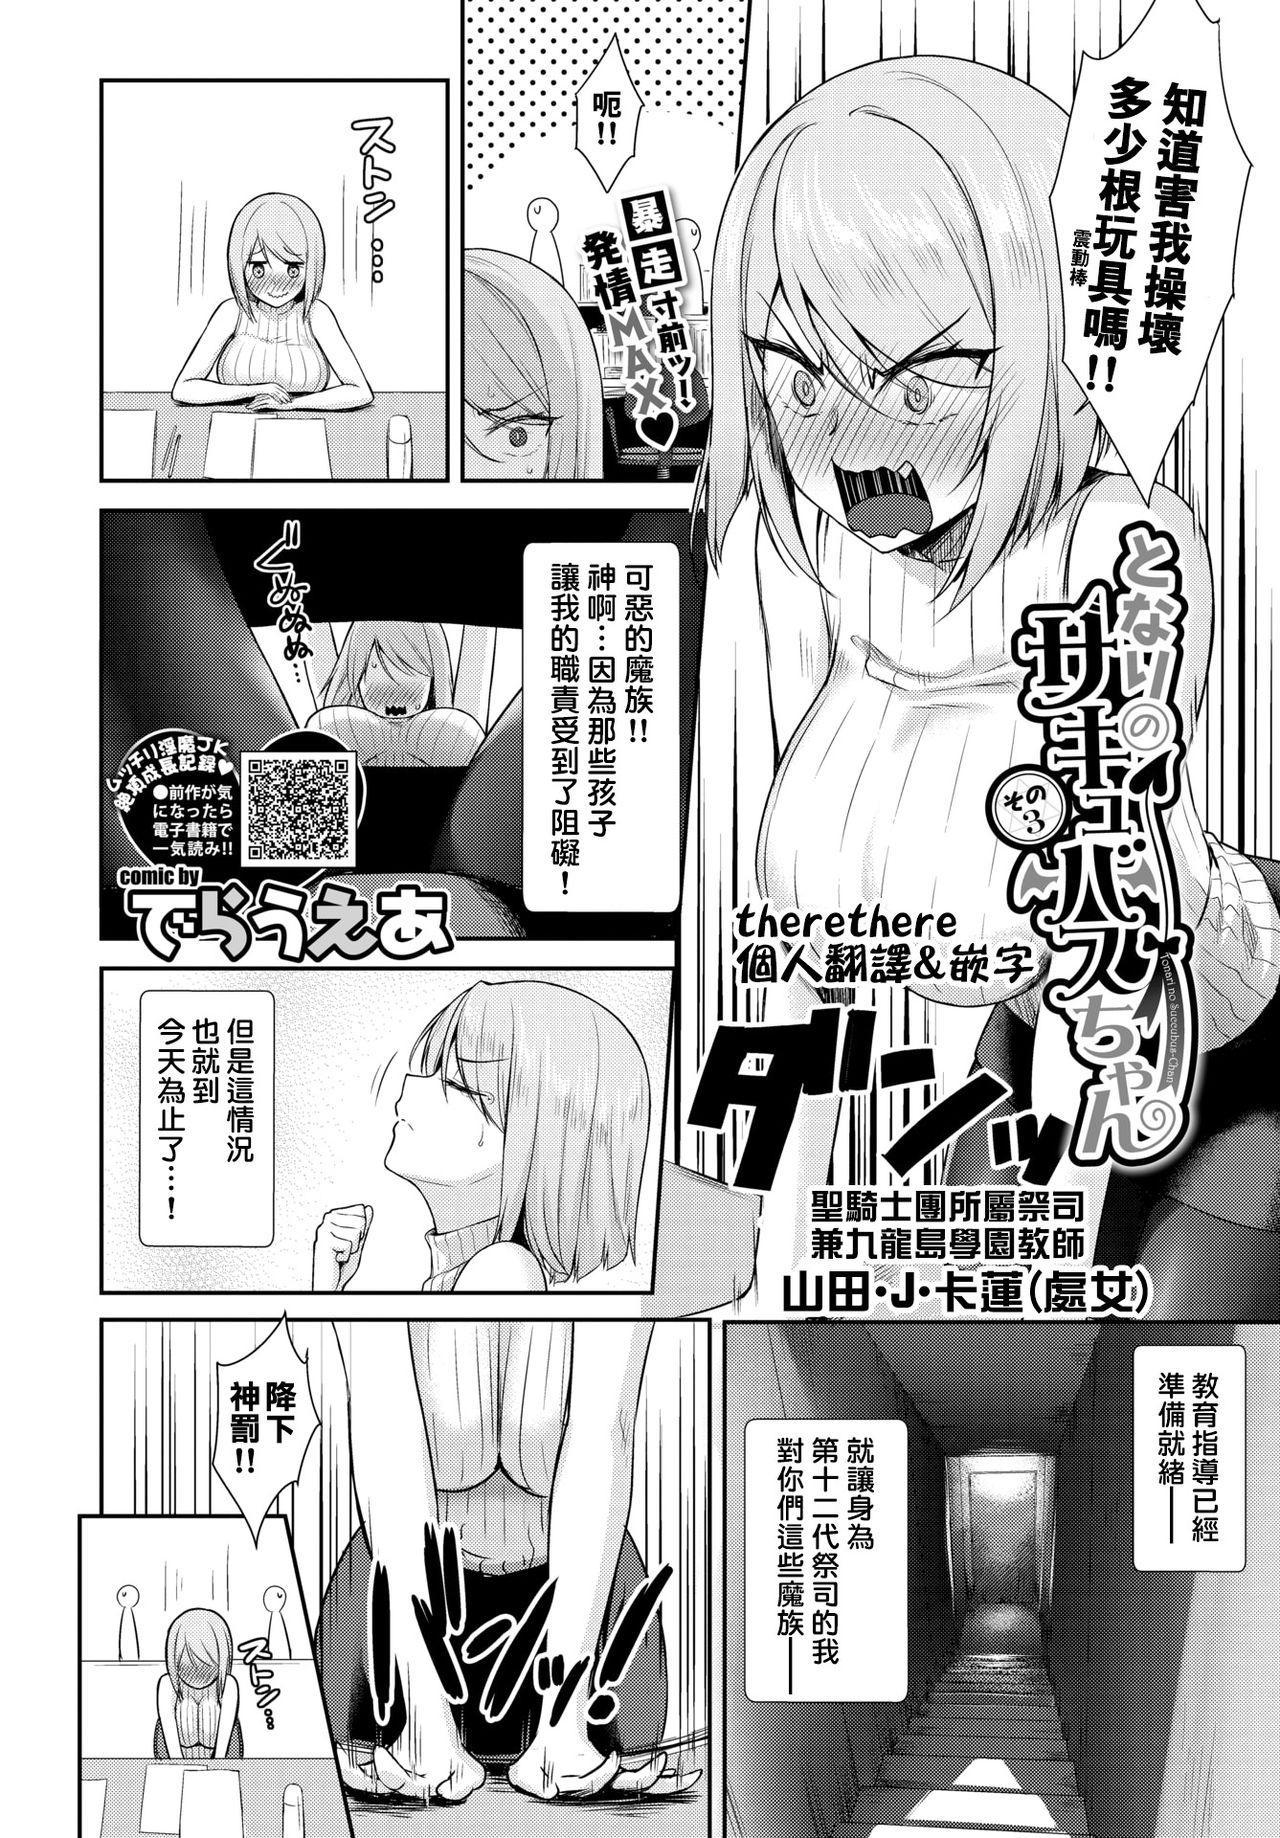 [Derauea] Tonari no Succubus-chan Ch. 1-3 [Chinese] [therethere個人翻譯&嵌字] [Digital] 48